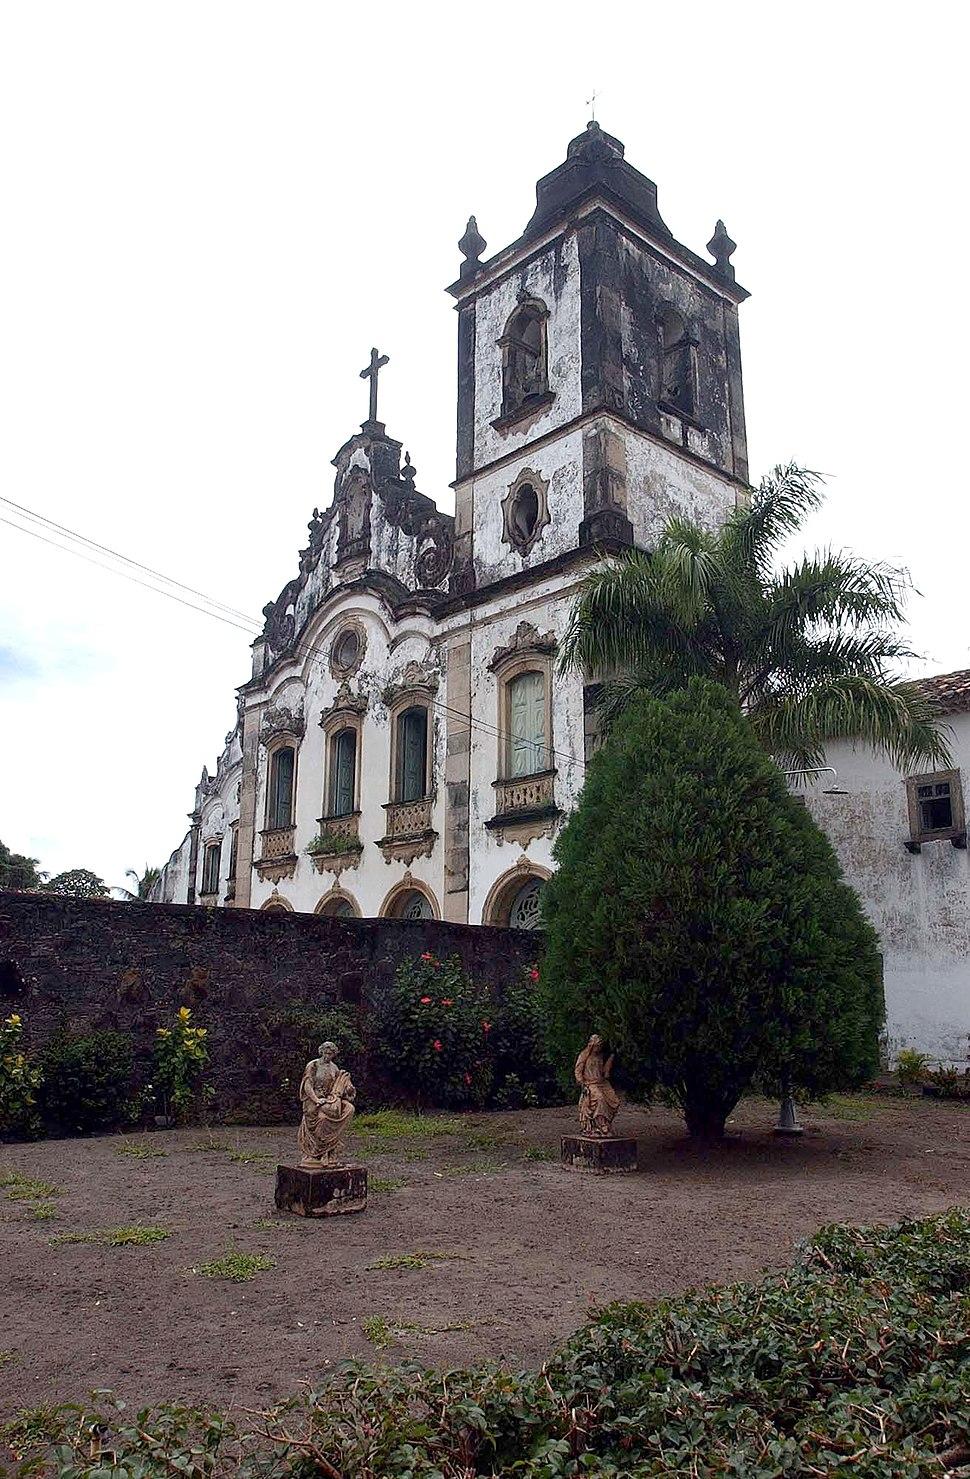 Museu de arte sacra do convento de Santa Maria (Marechal Deodoro, AL)